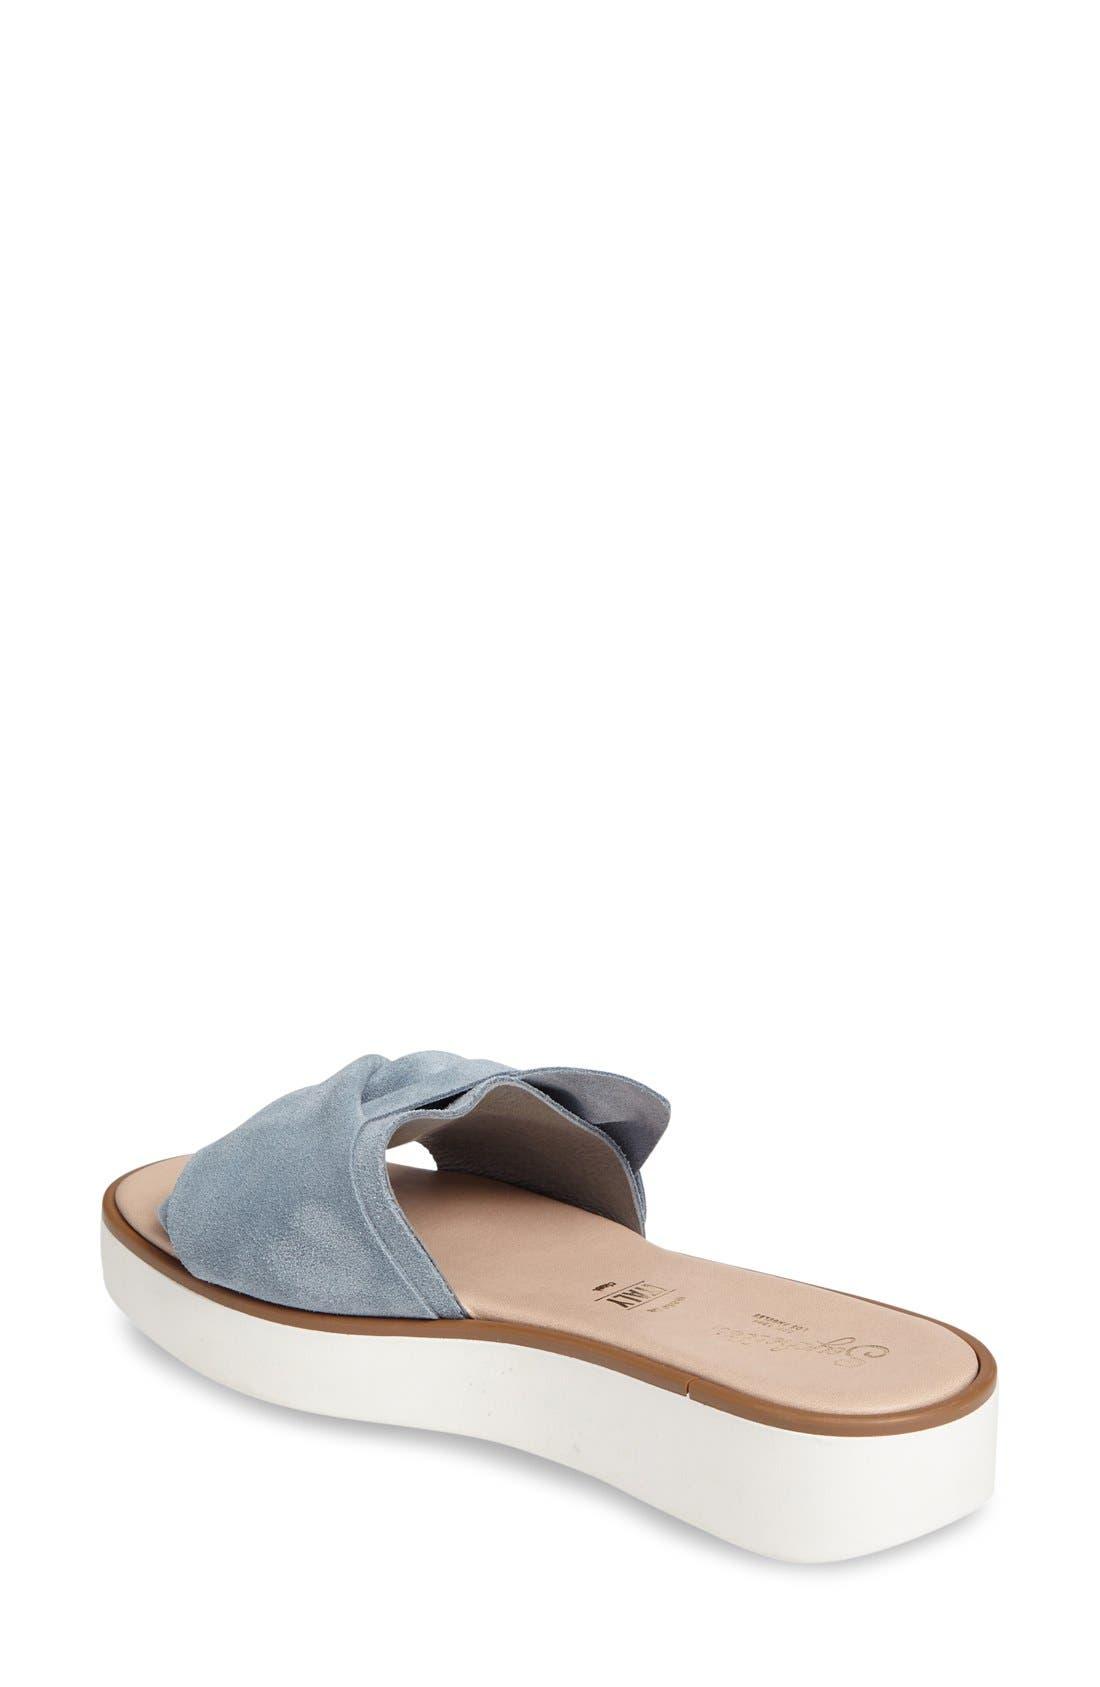 Coast Knotted Slide Sandal,                             Alternate thumbnail 2, color,                             Blue Suede